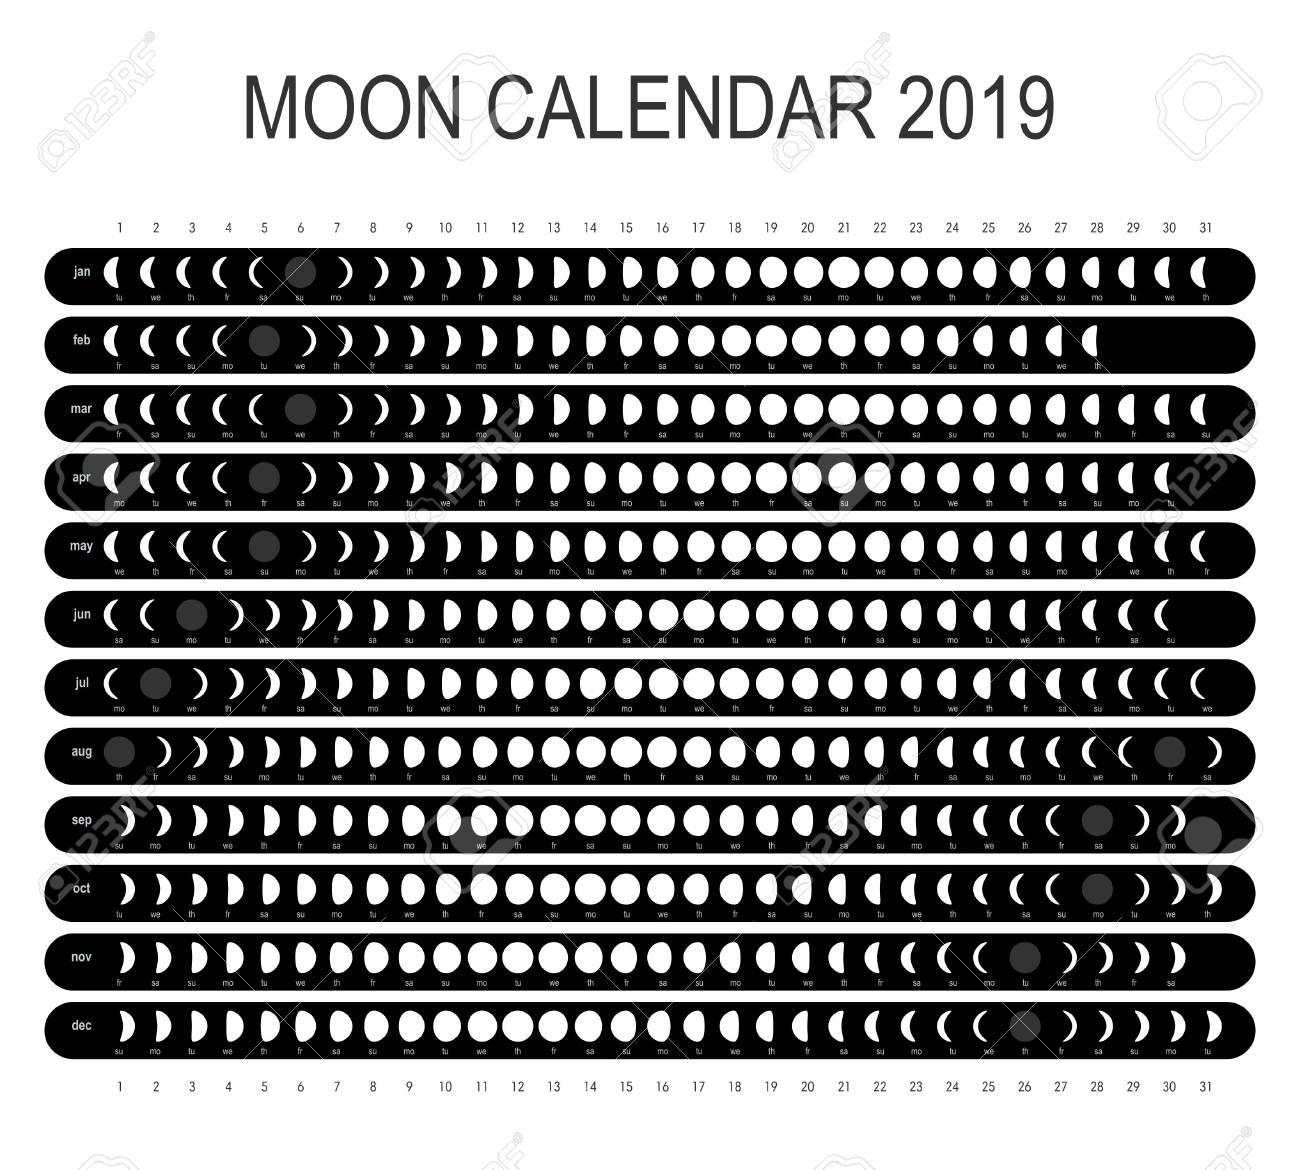 Free Lunar Calendar 2019 Moon Calendar 2019 Royalty Free Cliparts, Vectors, And Stock